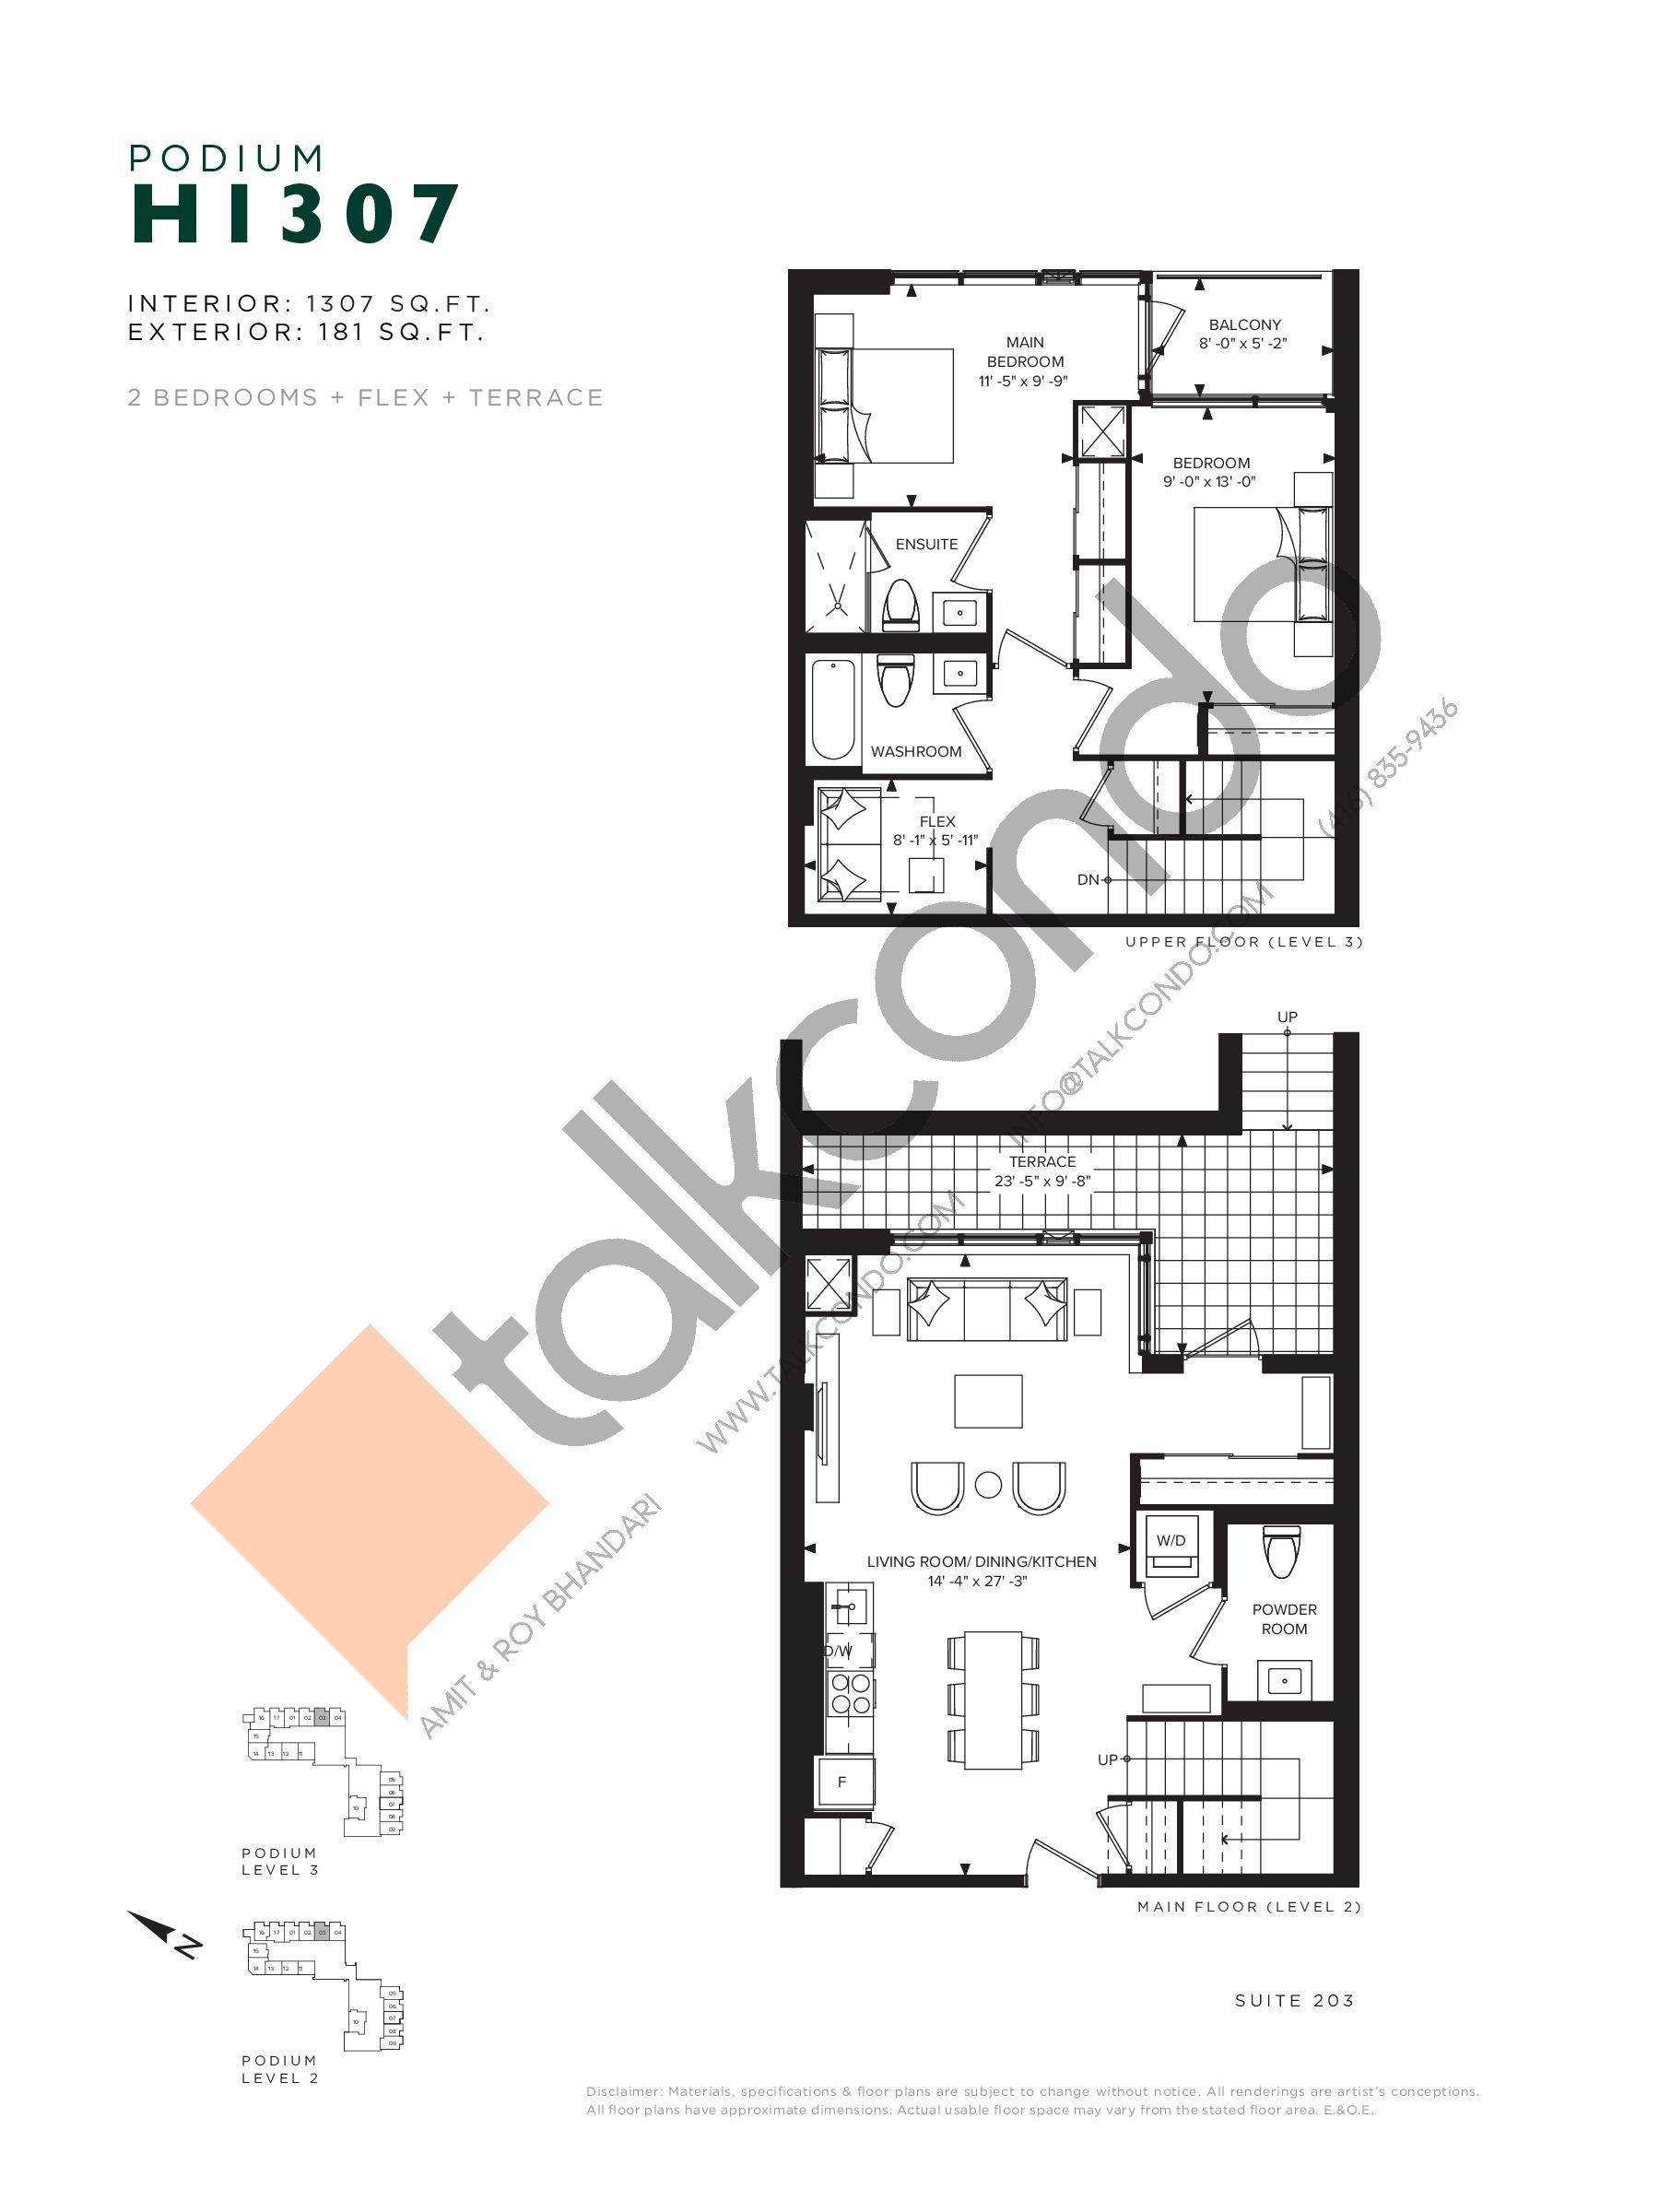 H1307 (Podium) Floor Plan at Hillmont at SXSW Condos - 1307 sq.ft